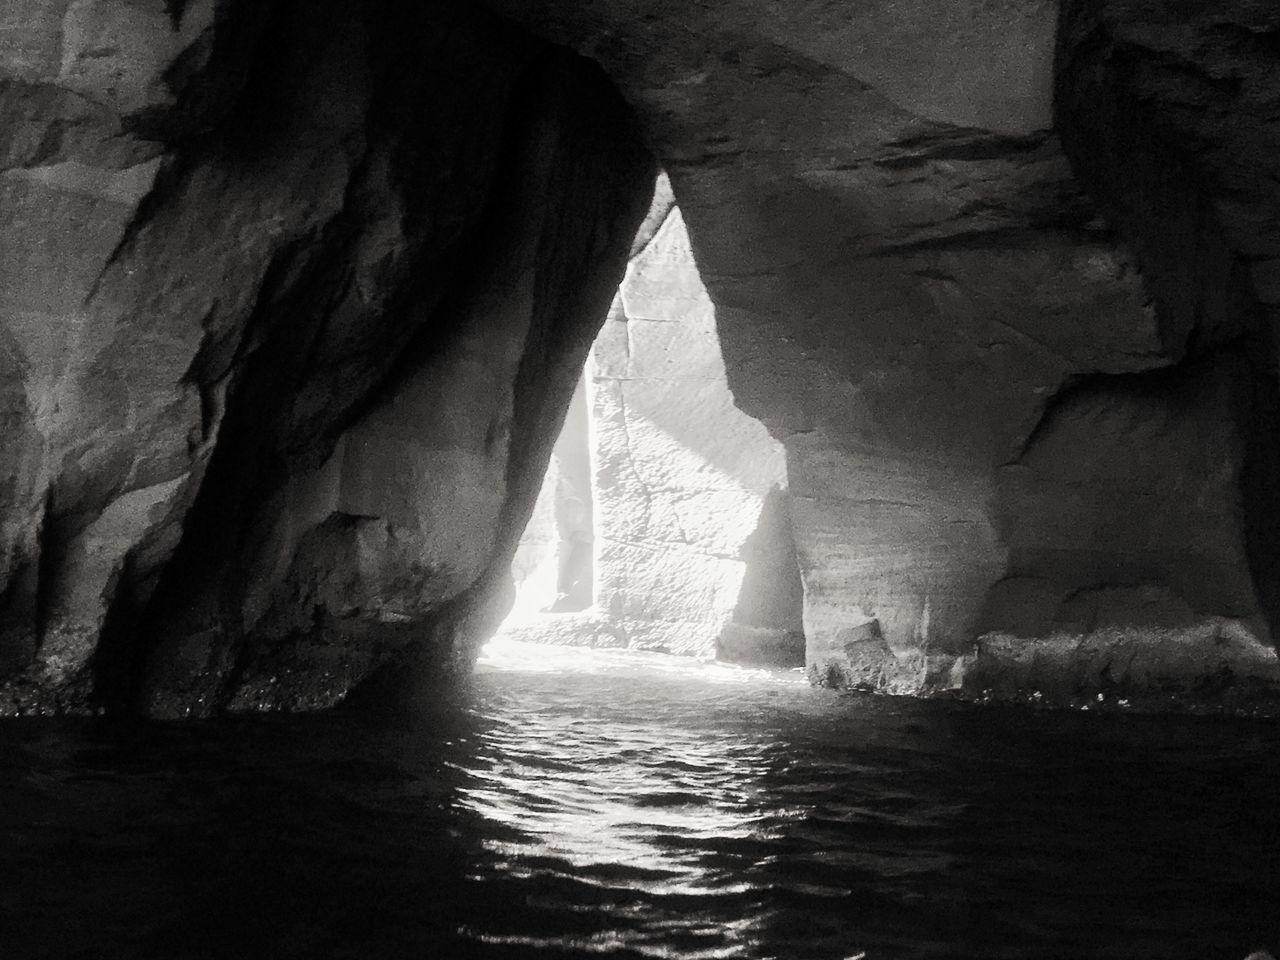 Cave Light Gulf Coast Napoli Italy Kayak See Blackandwhite Black & White Iphone6s David De La Cruz Delacruzfotografia